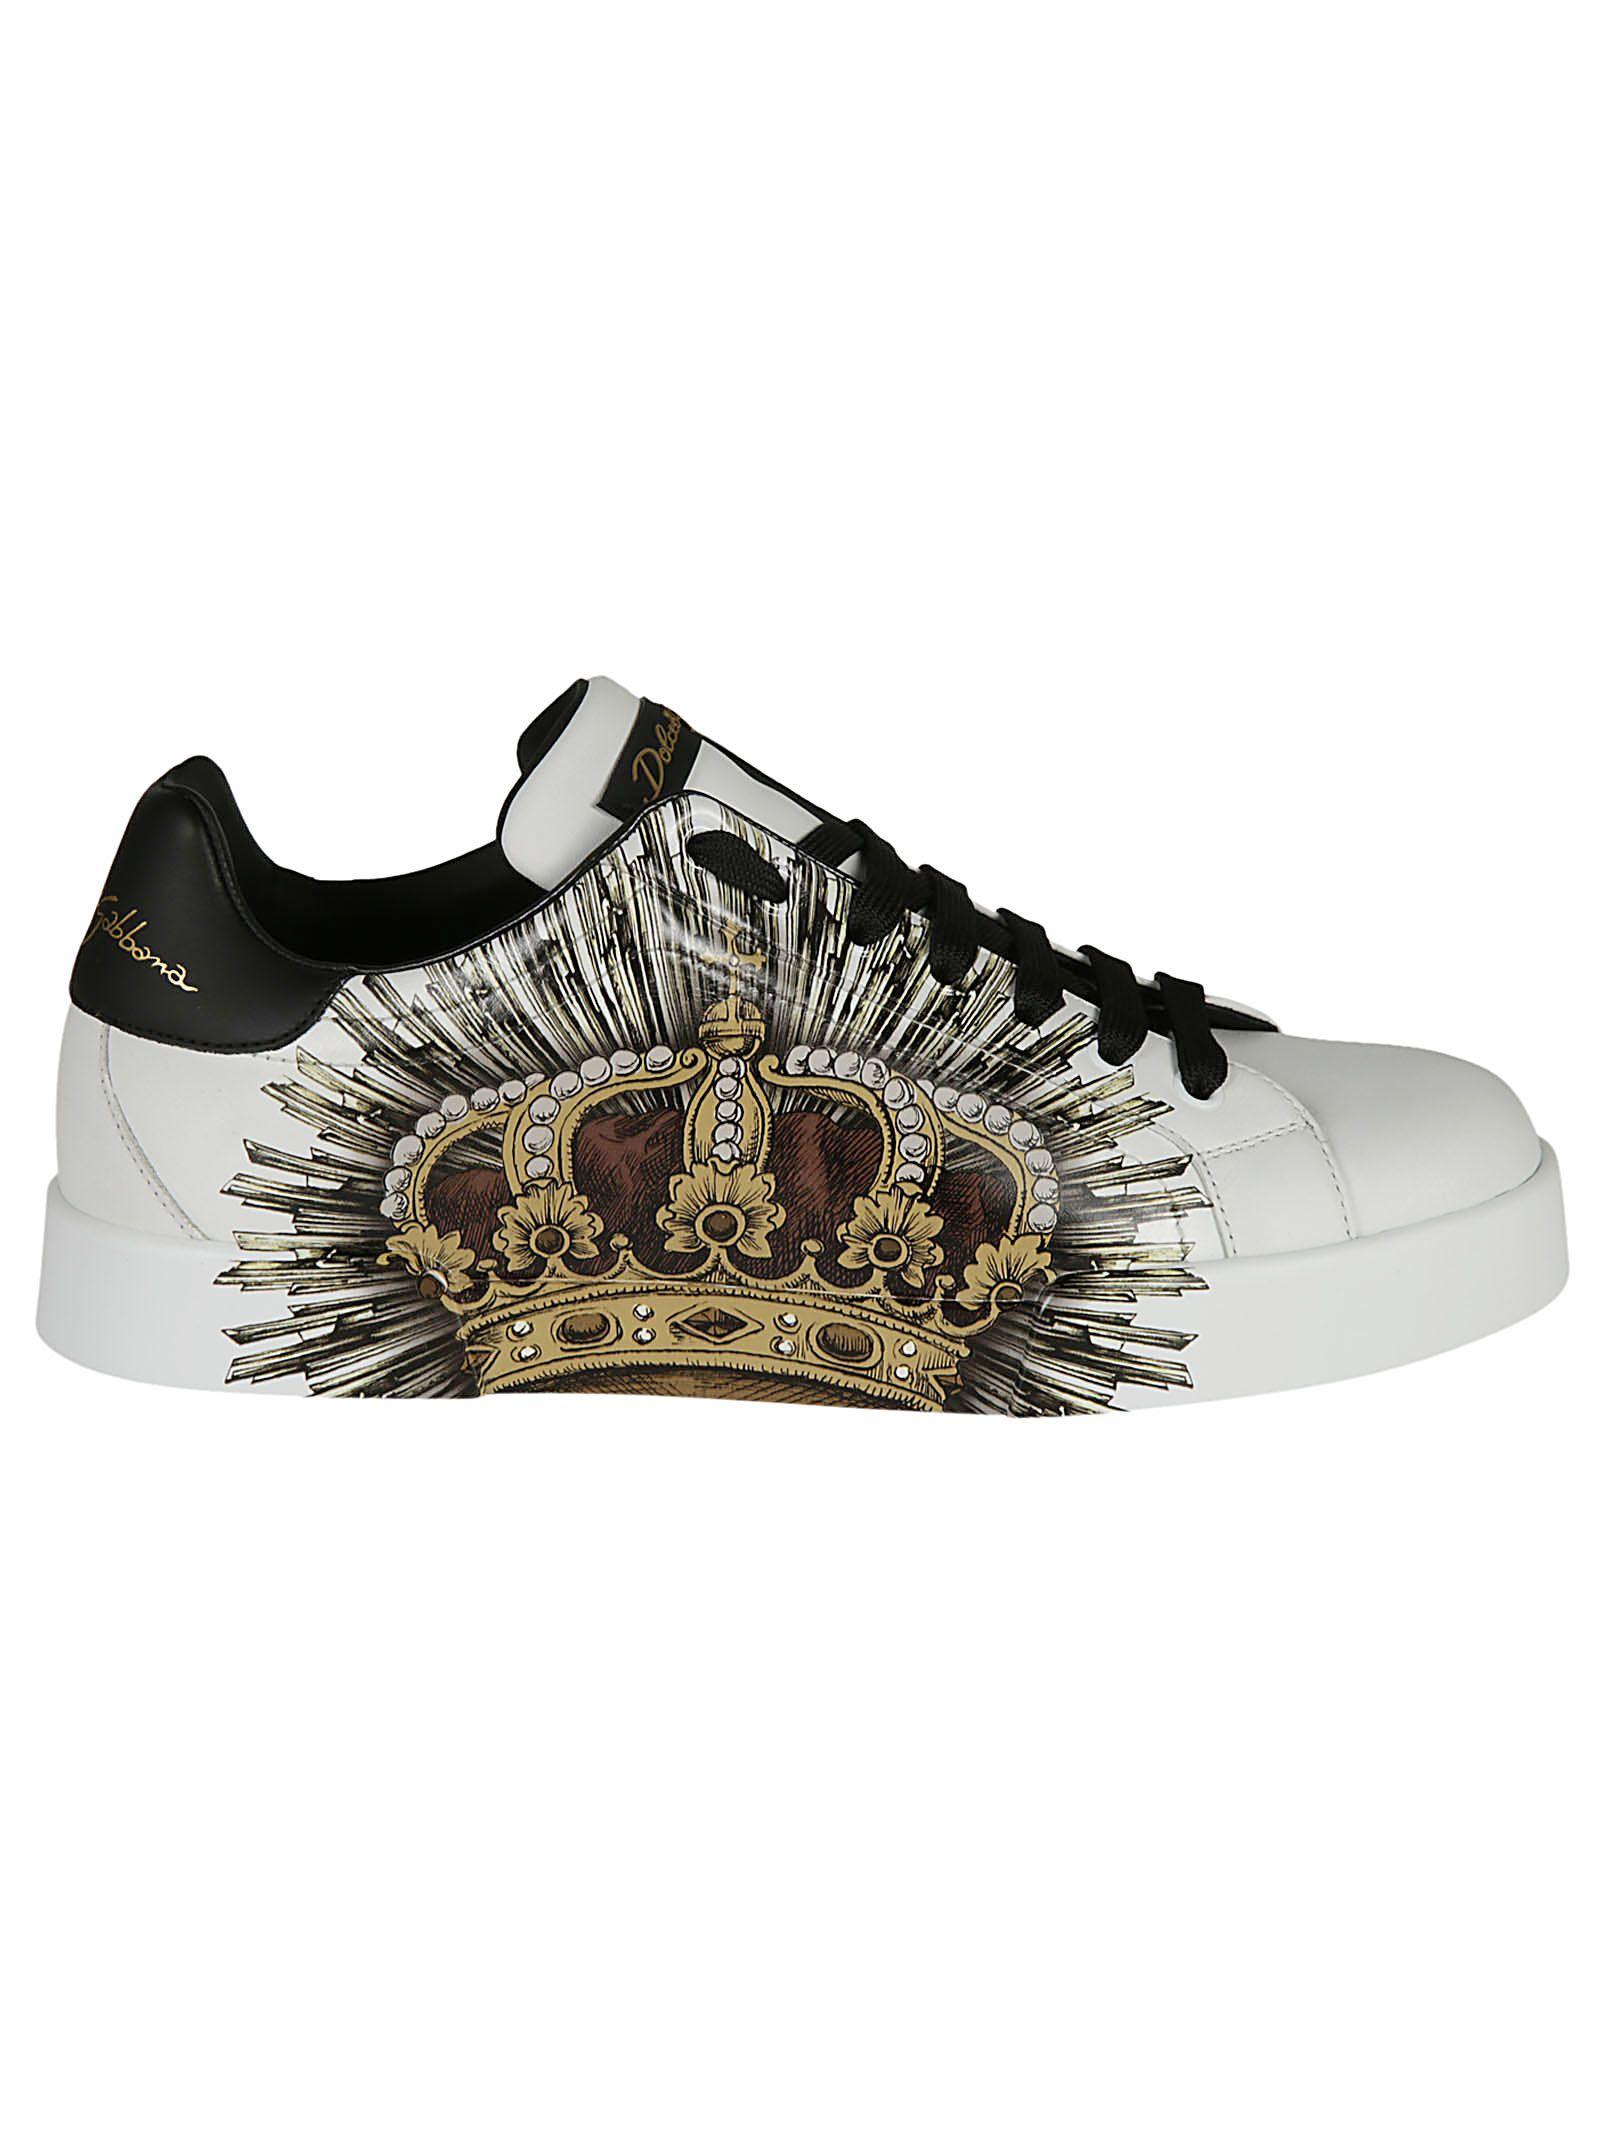 Dolce & Gabbana Graffiti Crown Print Sneakers